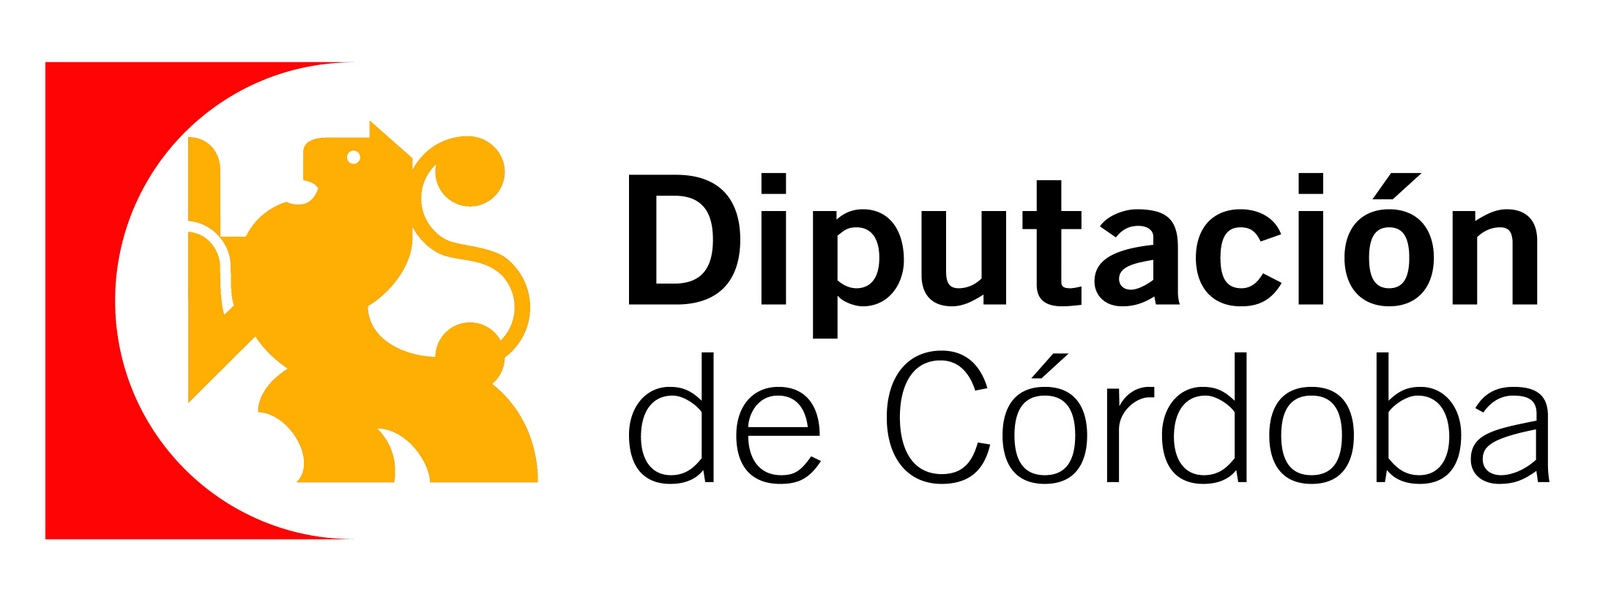 logo_diputacion_1_6